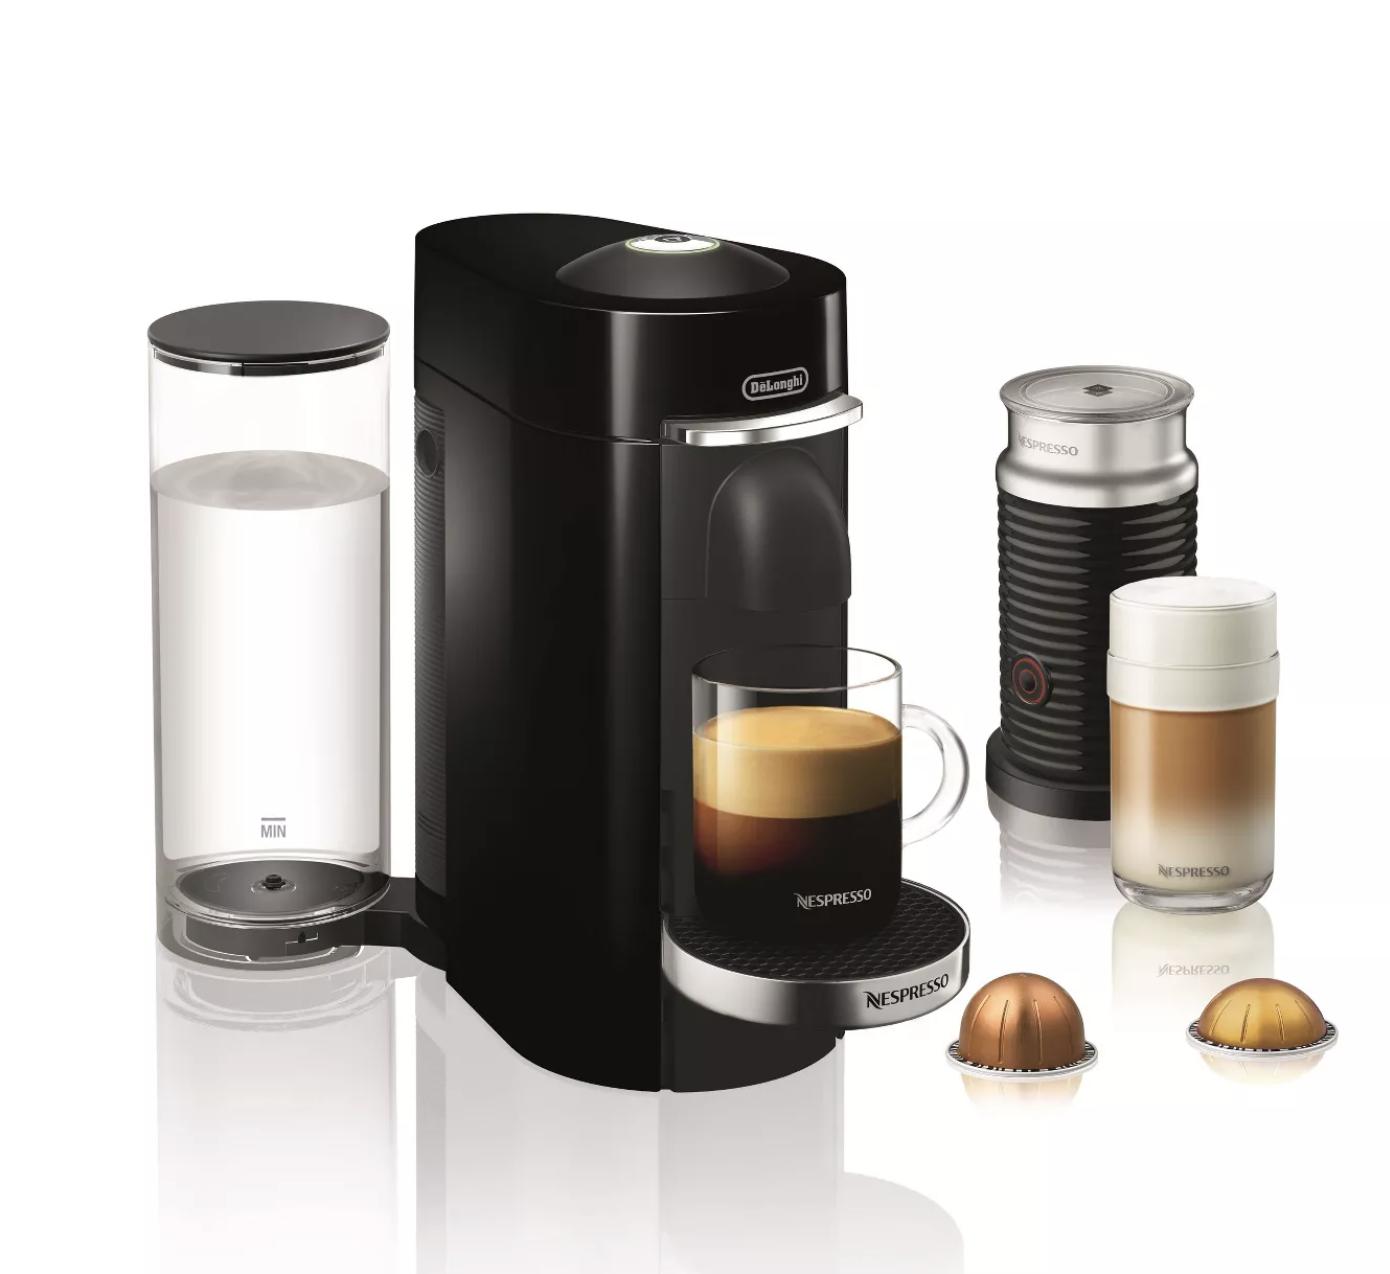 The Nespresso coffee maker